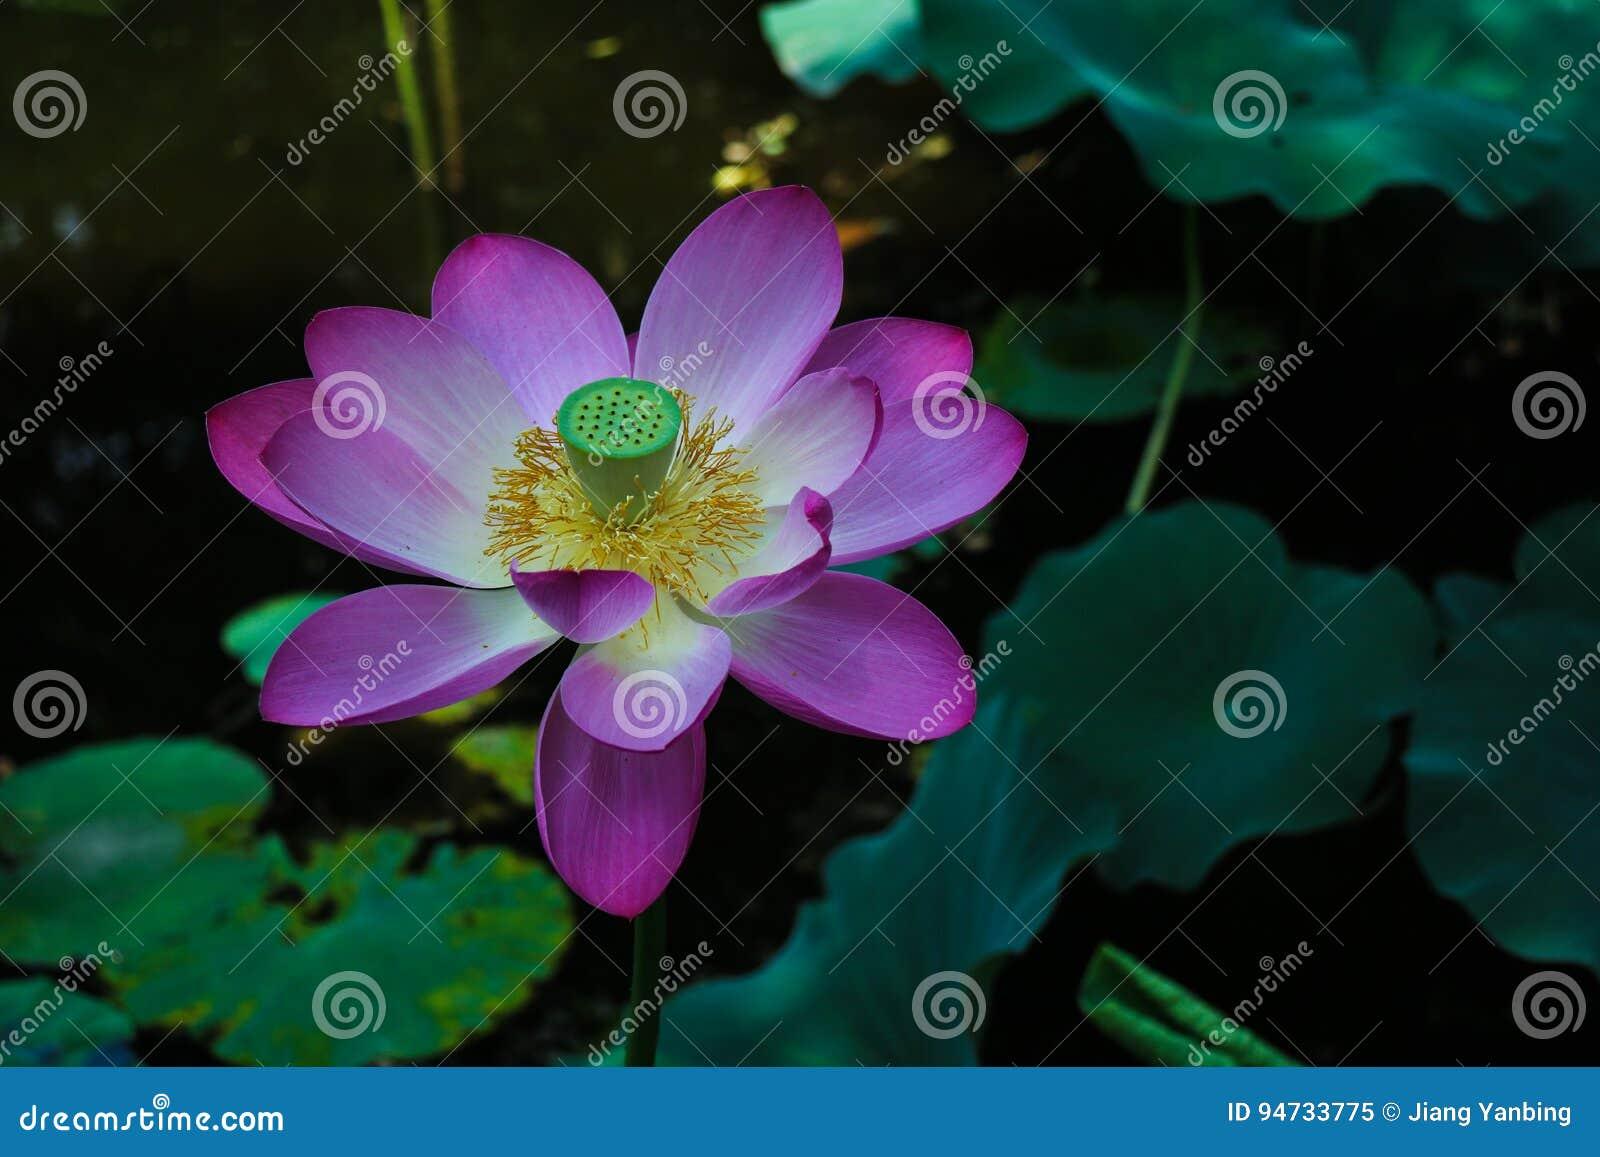 Lotus flower stock image image of lotus flora plant 94733775 royalty free stock photo izmirmasajfo